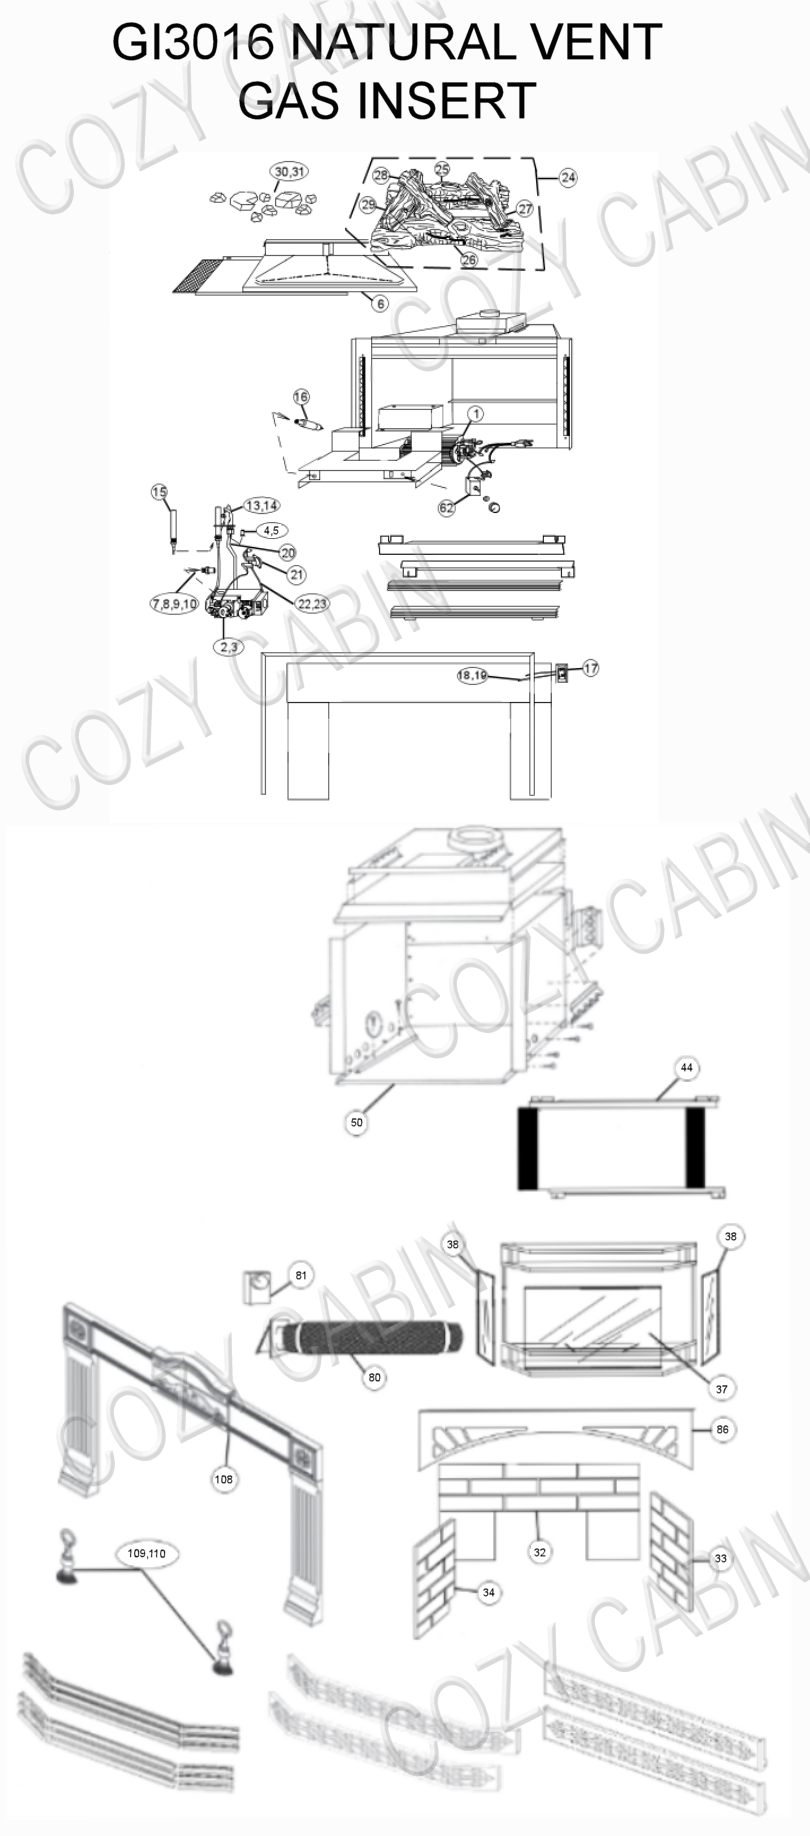 Gas Fireplace Insert (GI3016) (GI3016) Napoleon Parts